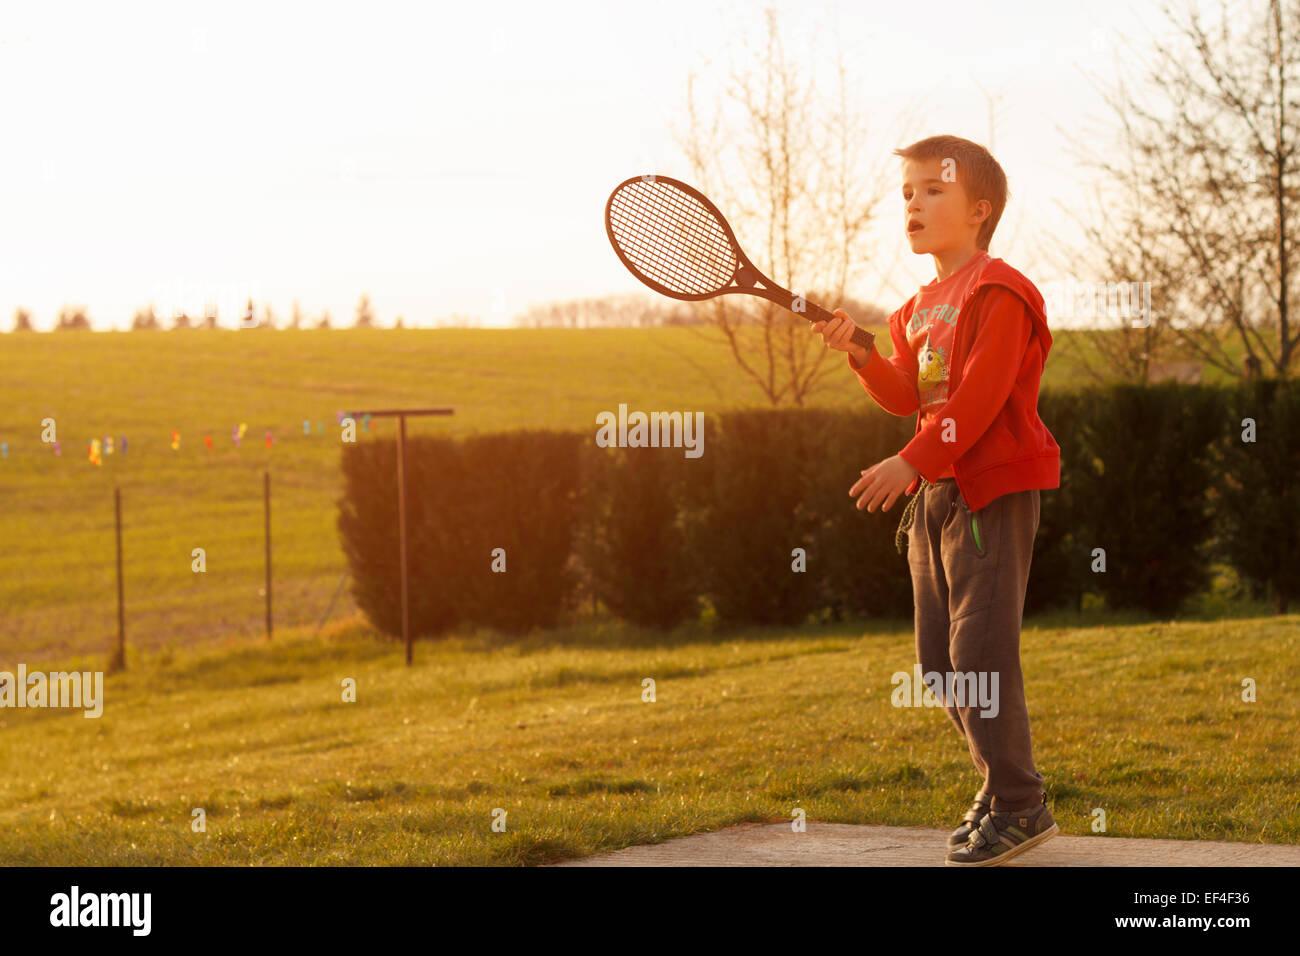 boy playing tennis in backyard - Stock Image